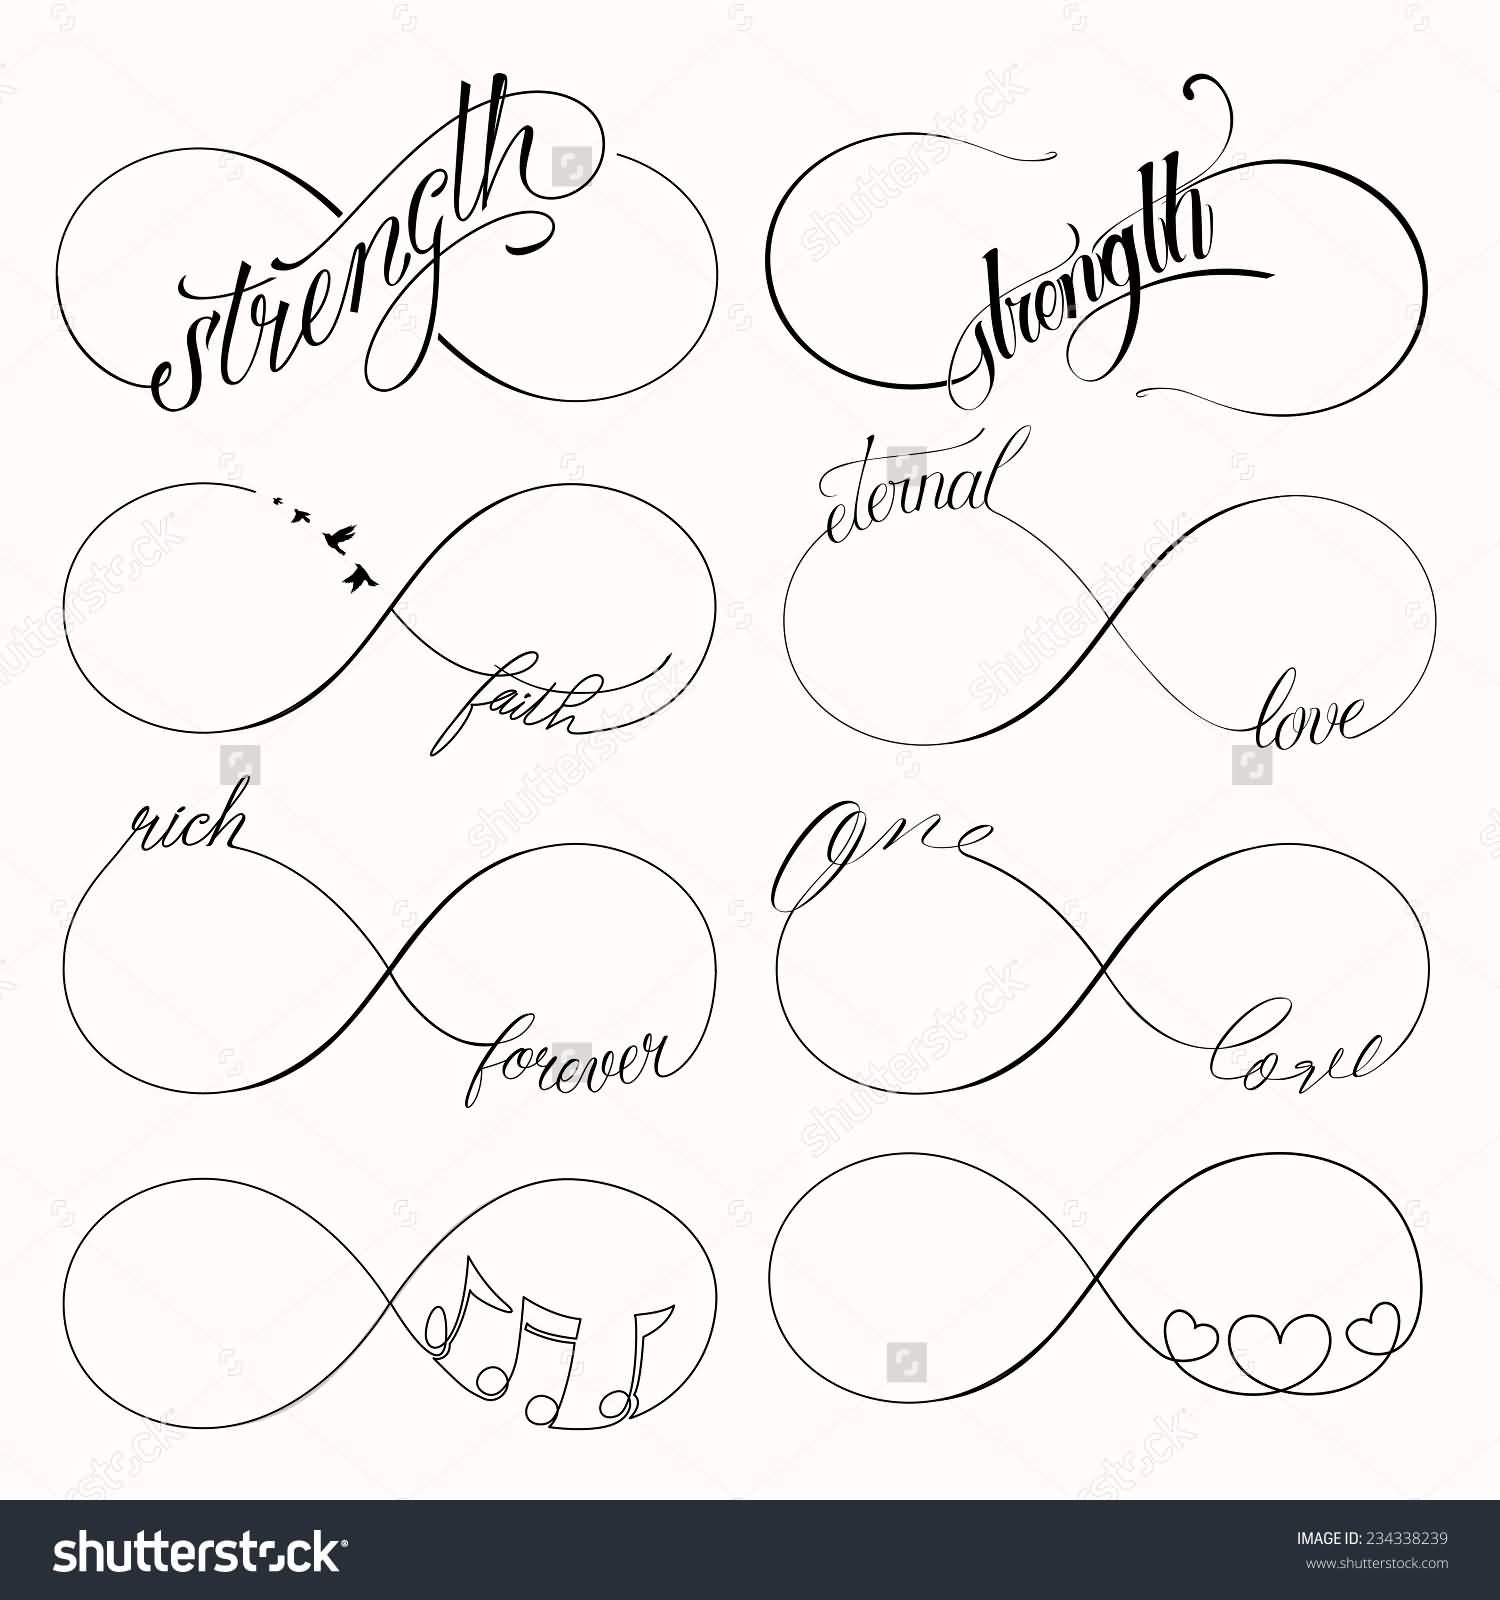 Popular Infinity Symbols Tattoo Design Tattoo Ideas Pinterest